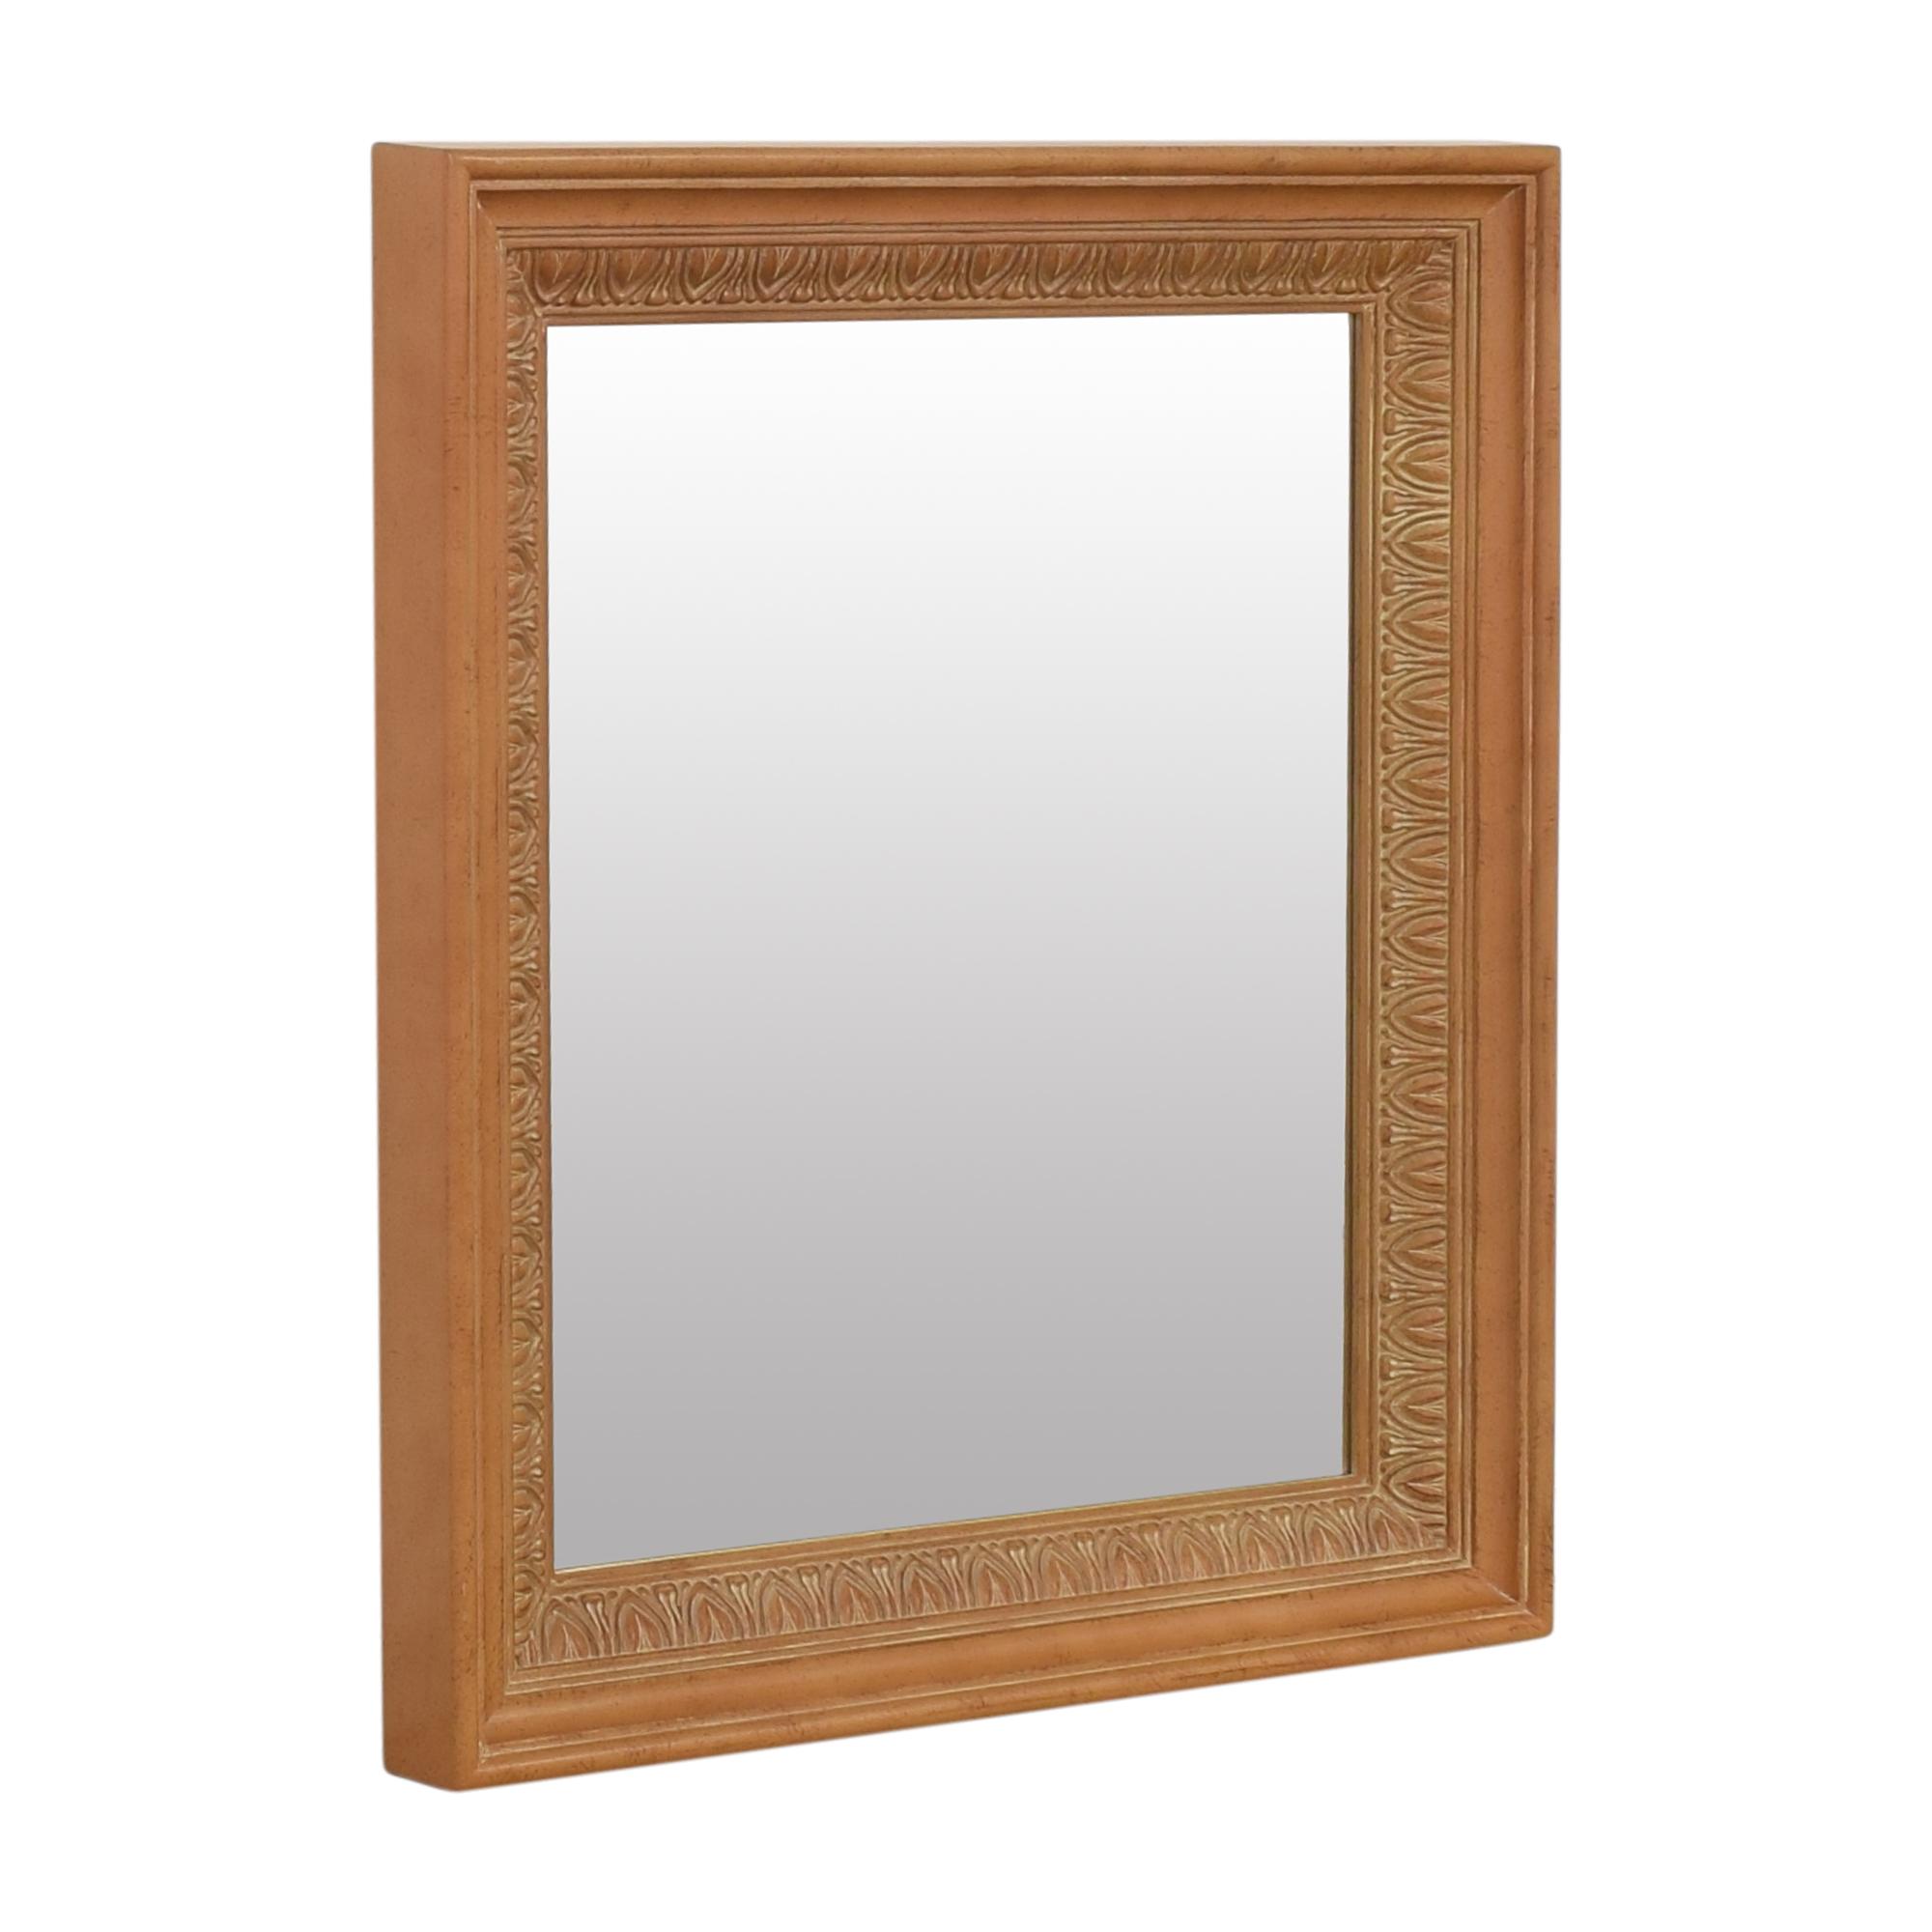 Thomasville Thomasville Carved Wall Mirror